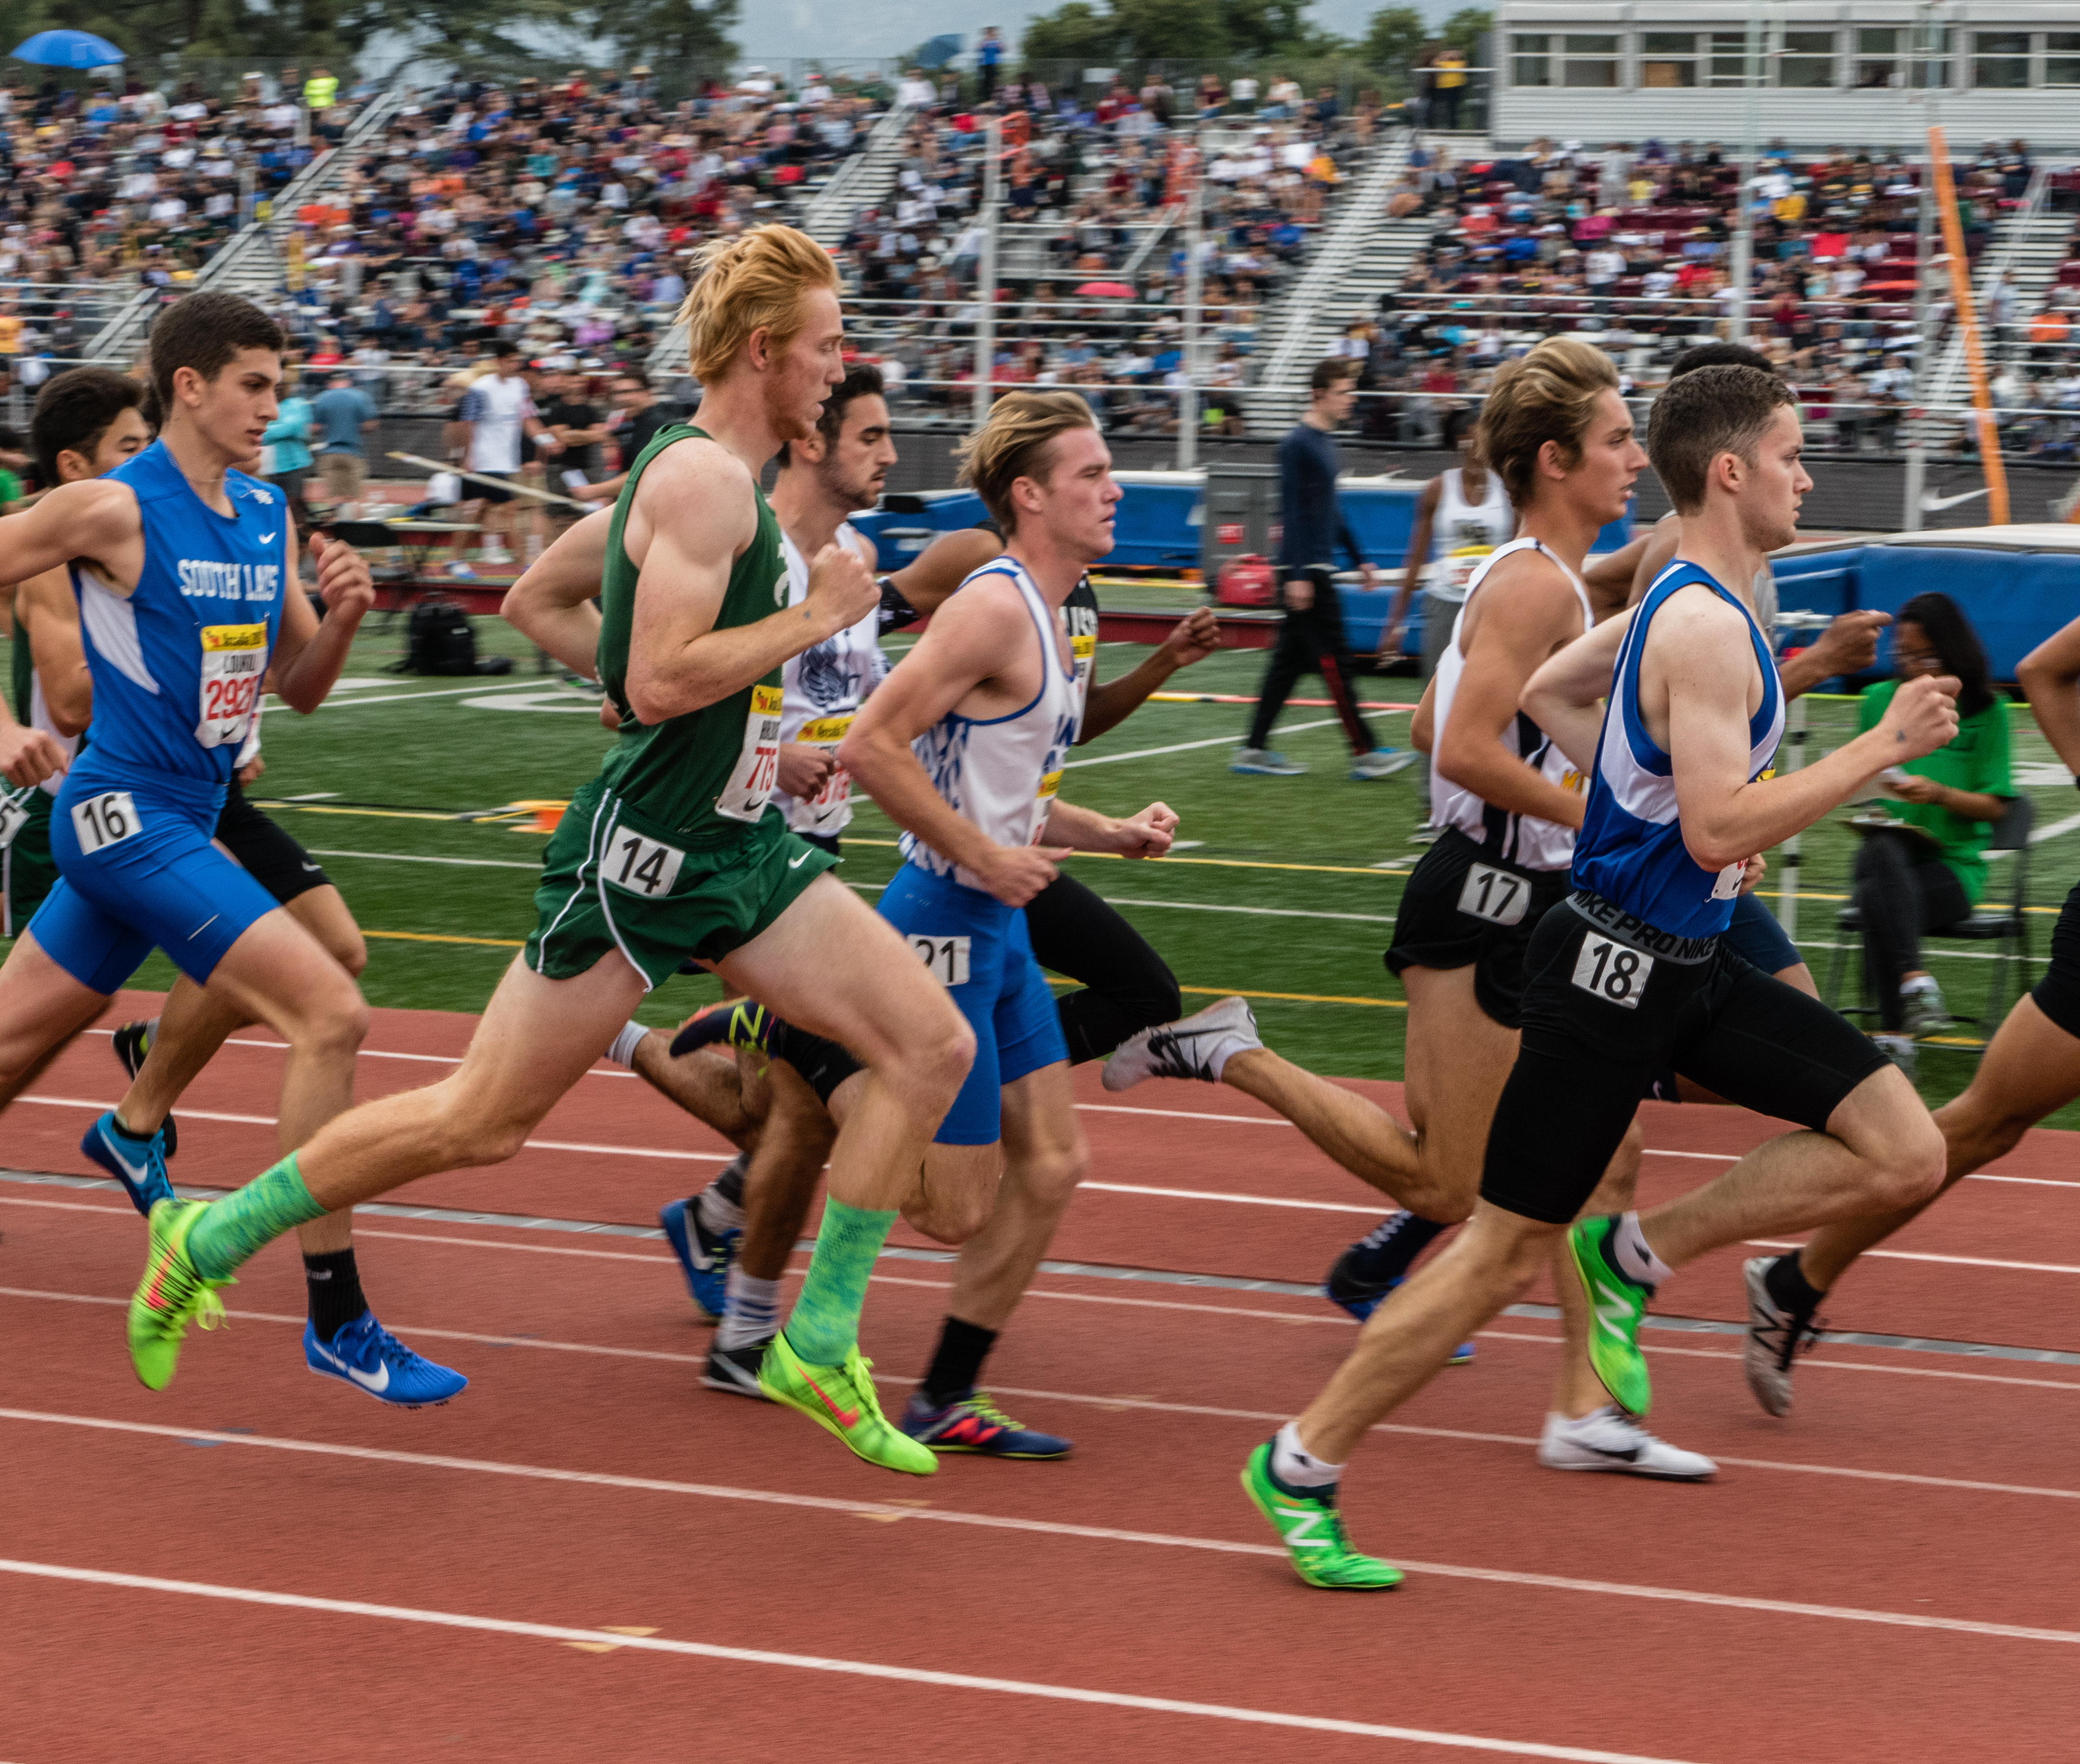 Ian Hurlburt Breaks School Record in 800